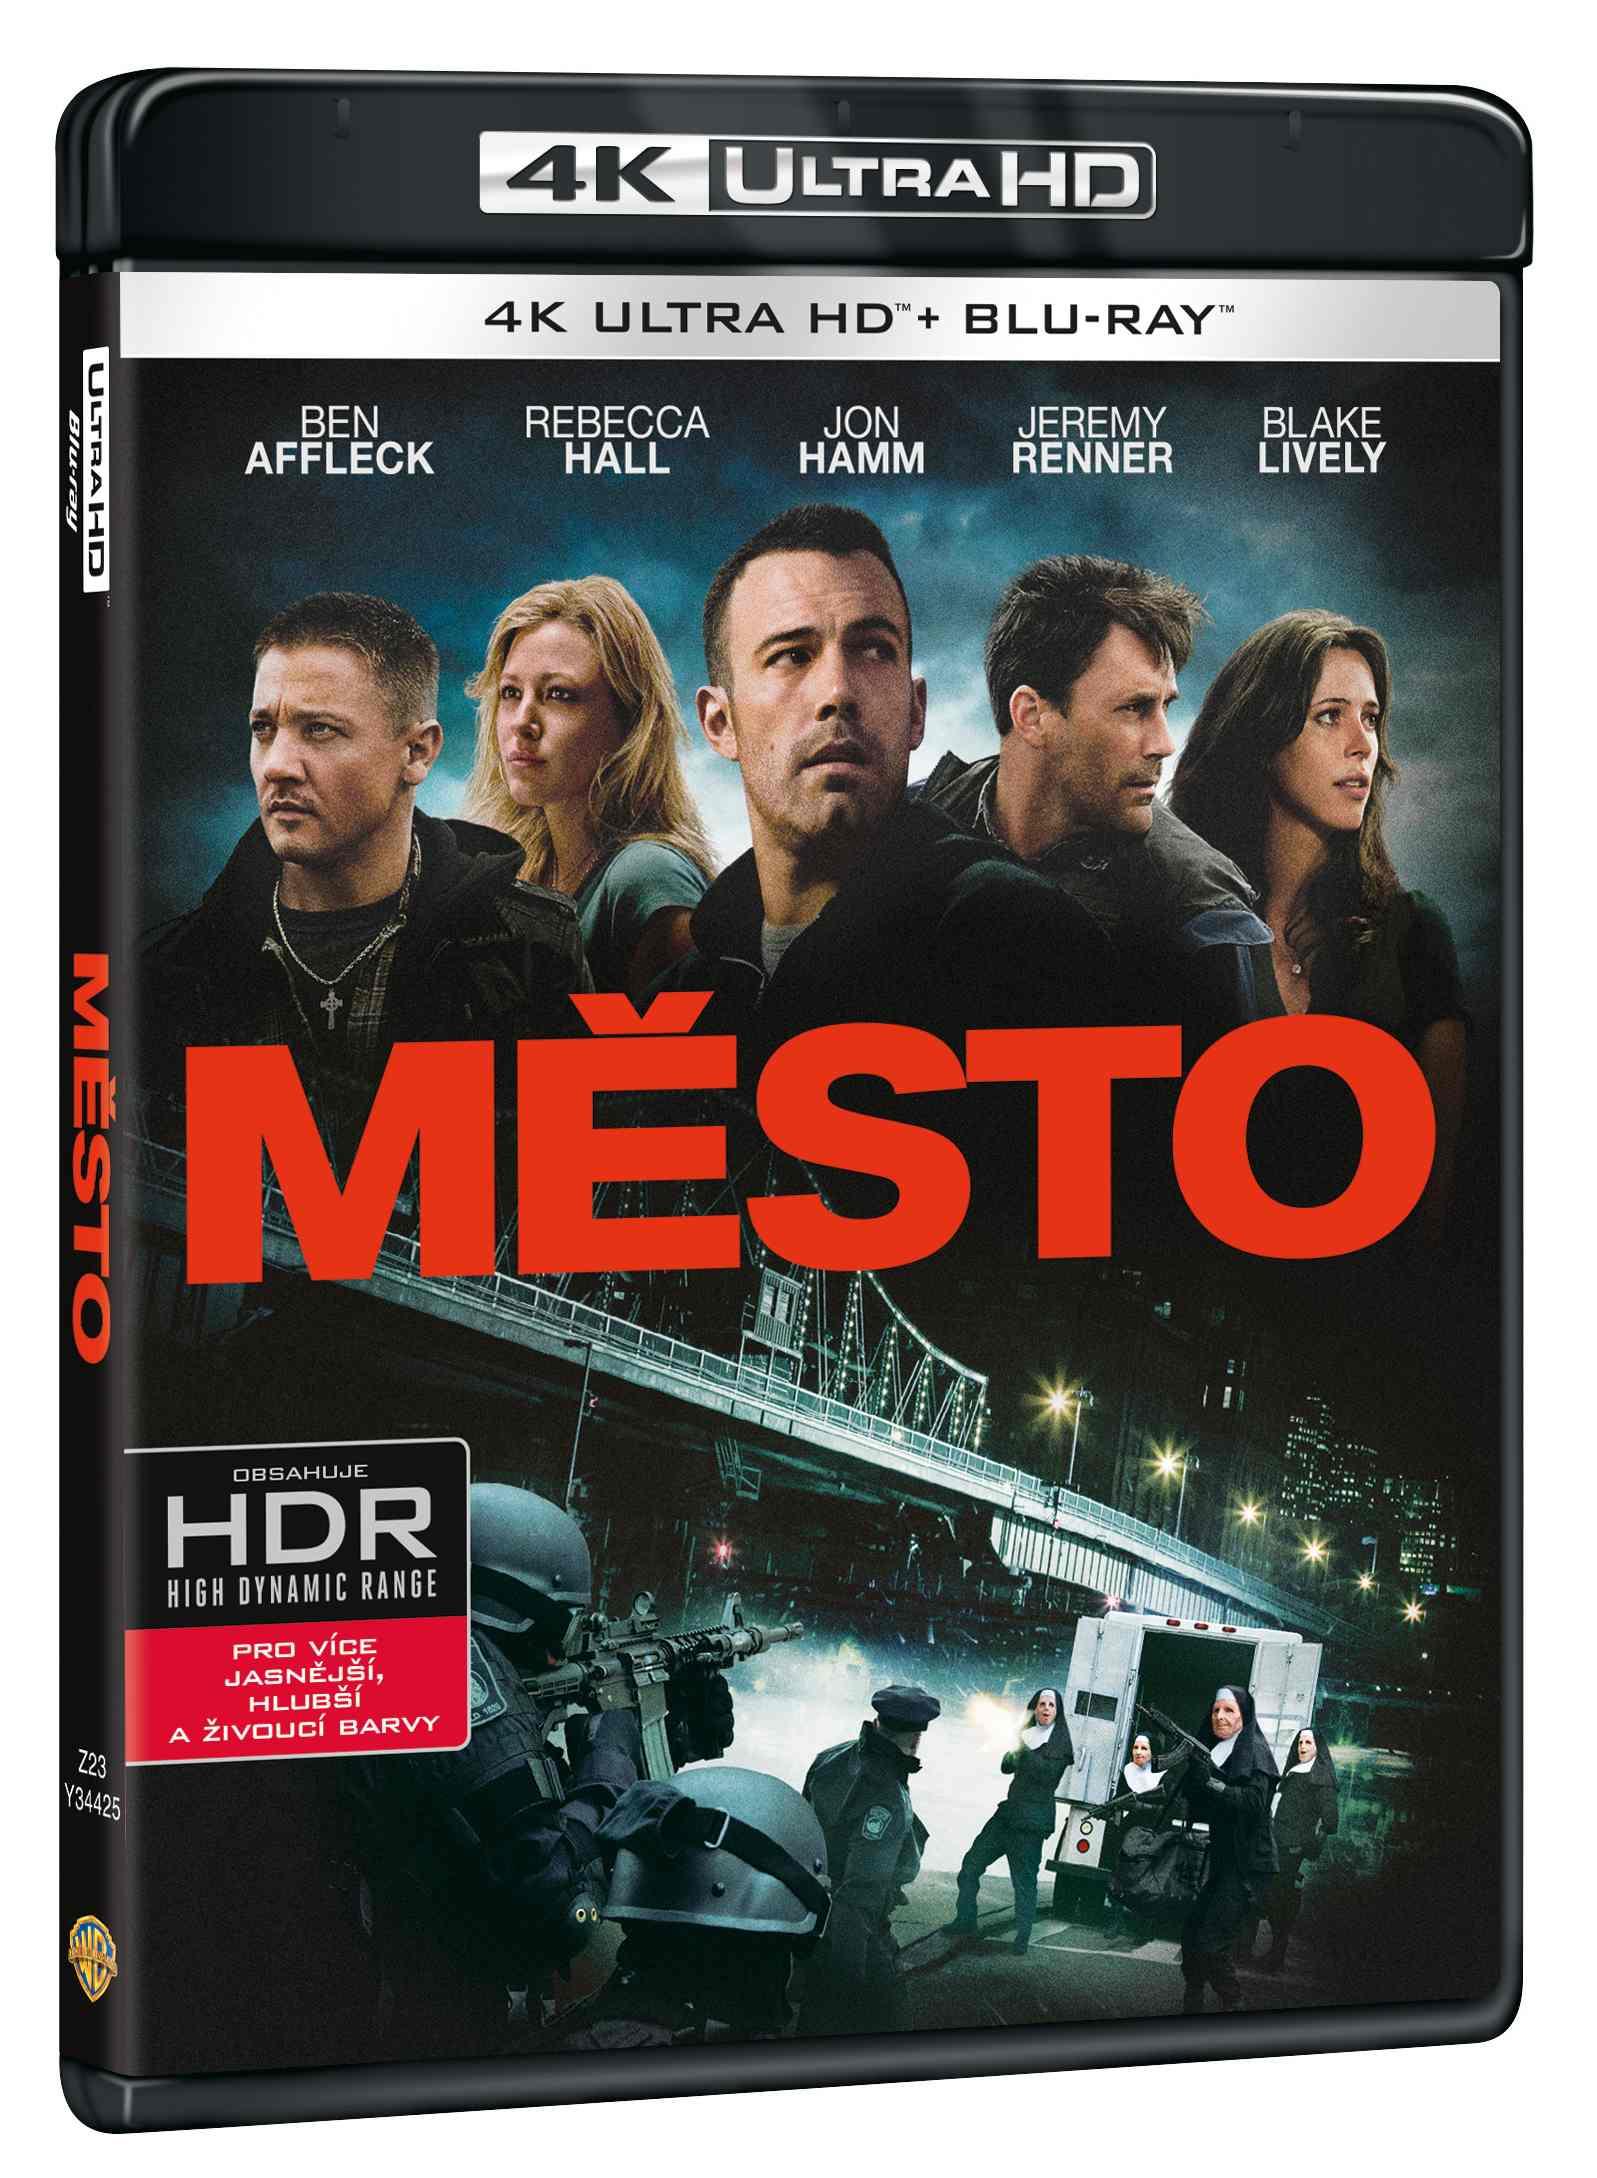 MĚSTO (4K ULTRA HD) - UHD Blu-ray + Blu-ray (2 BD)